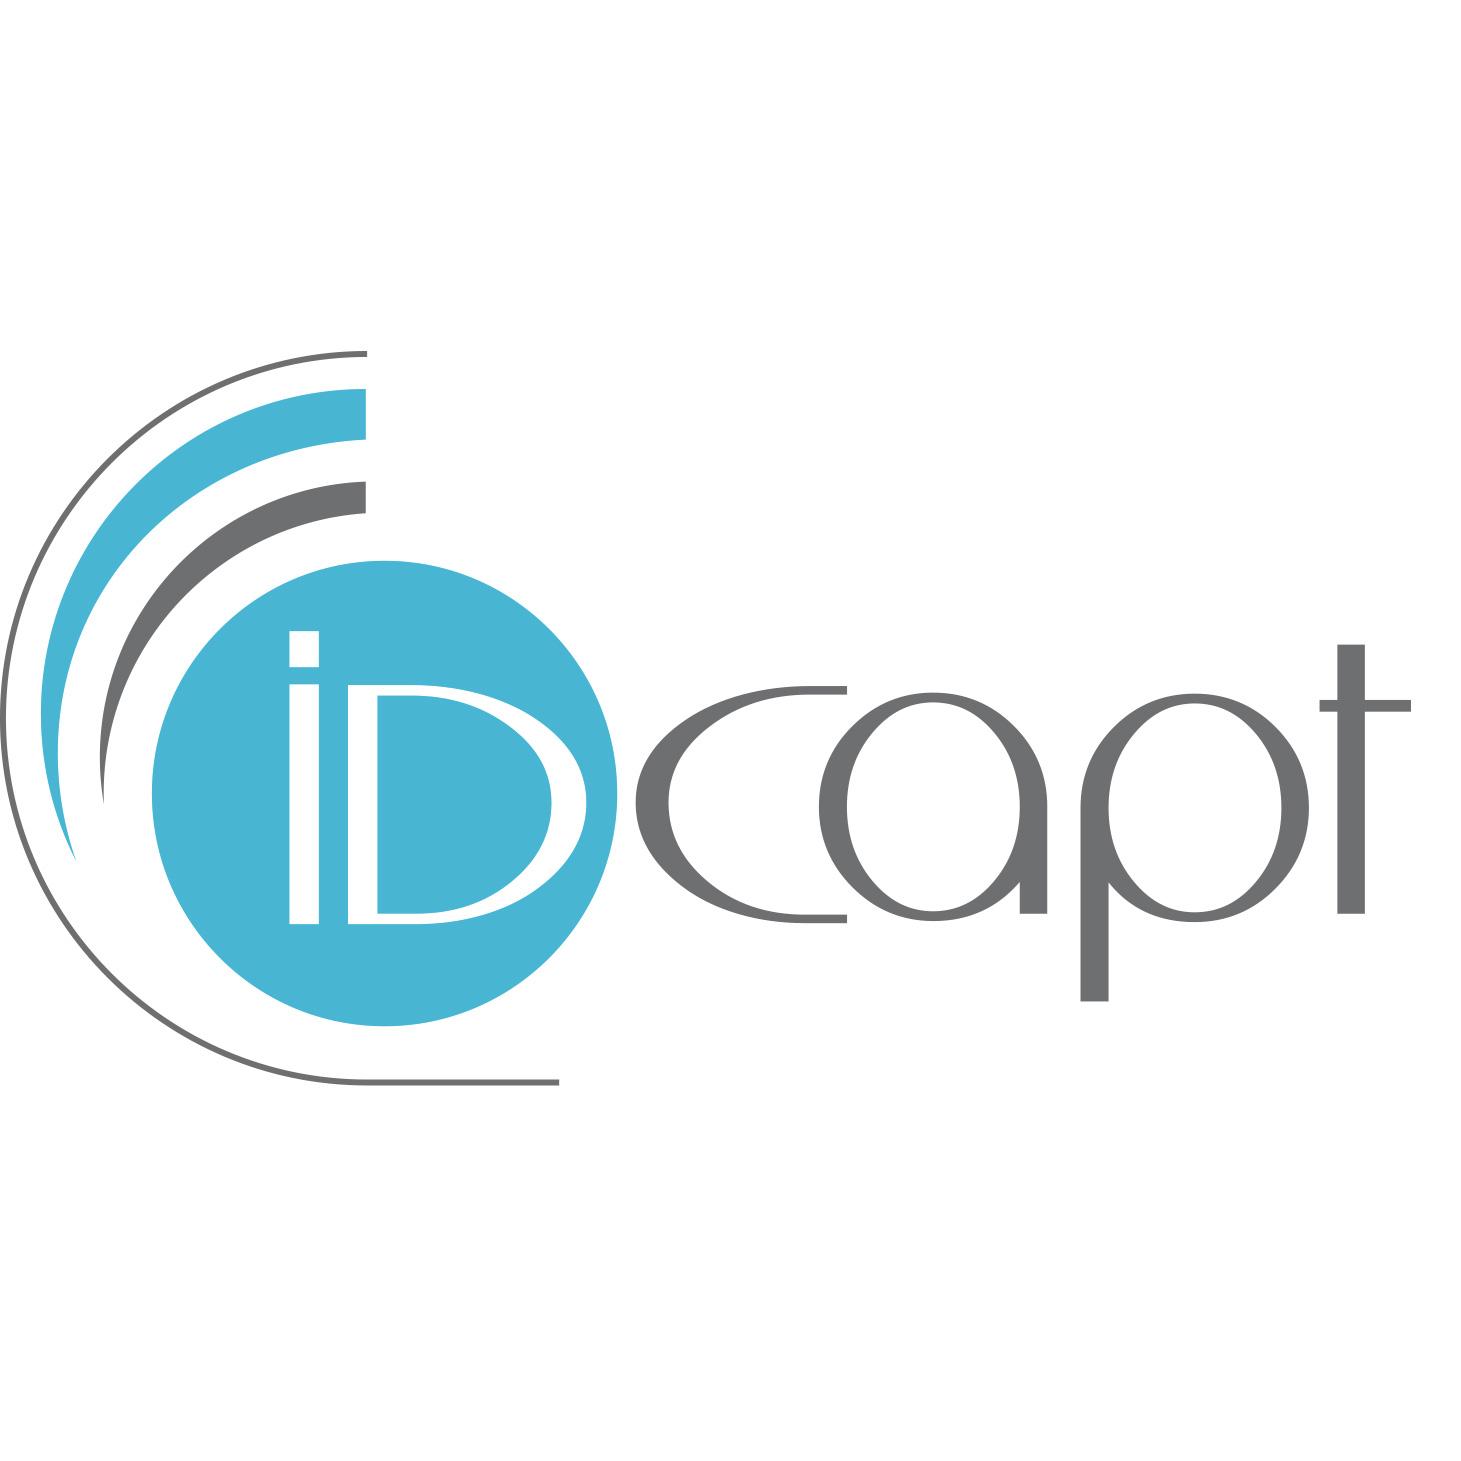 Logo ID capt